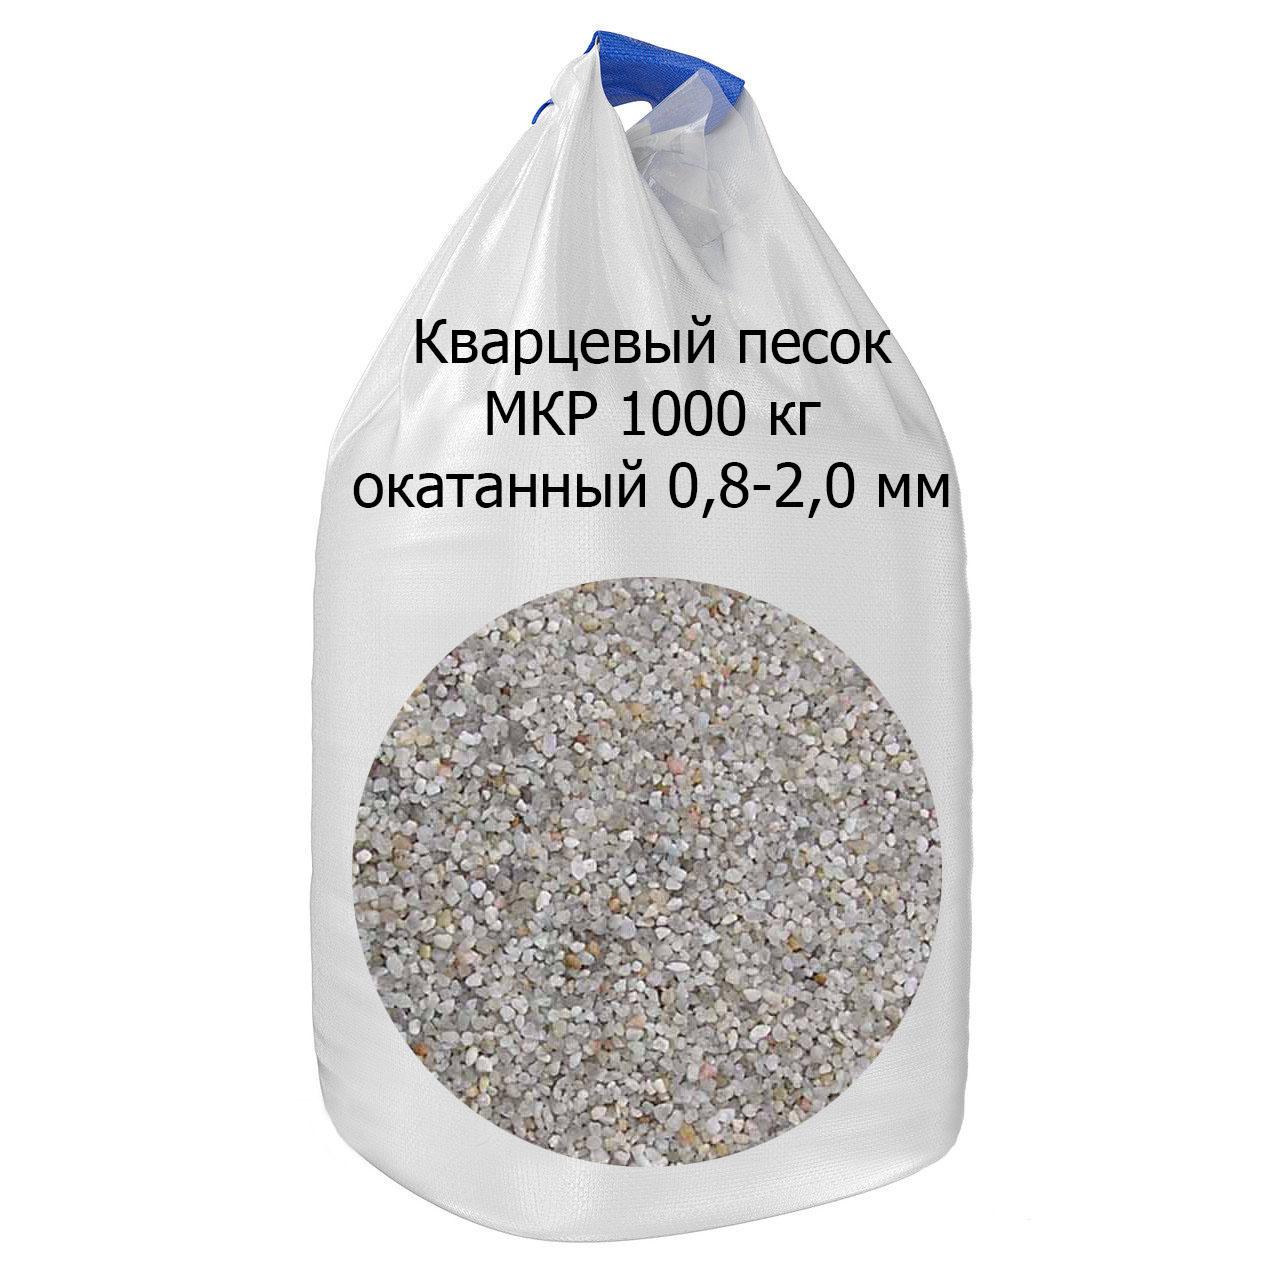 Кварцевый 0,8-2,0 мм в МКР (биг-бэг) 1000 кг